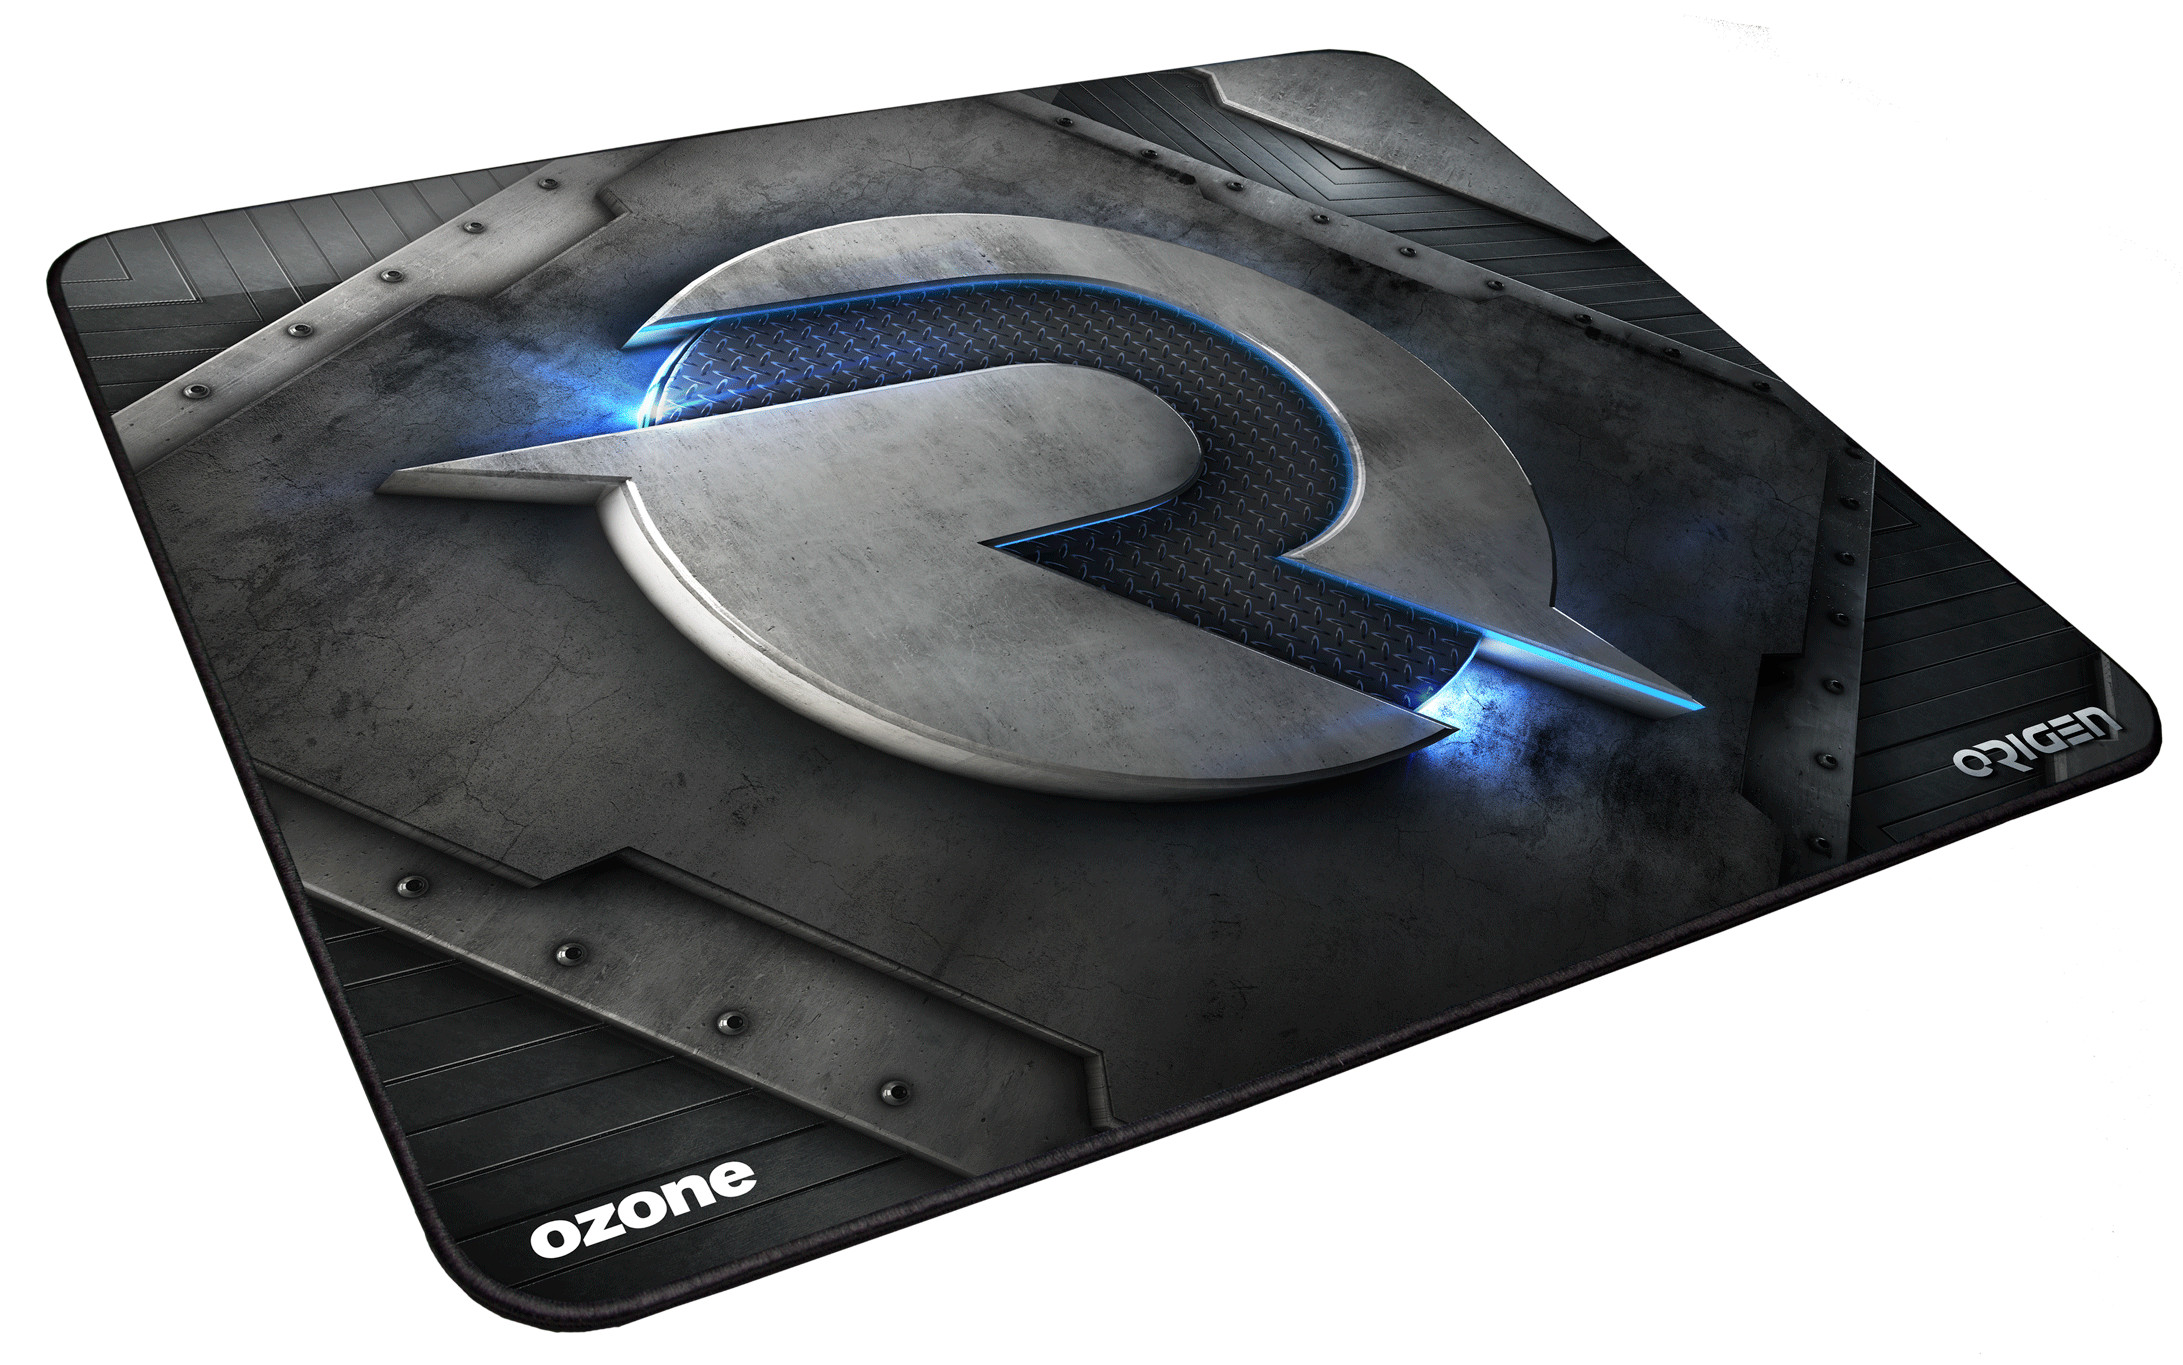 Ozone Origen mouse pad